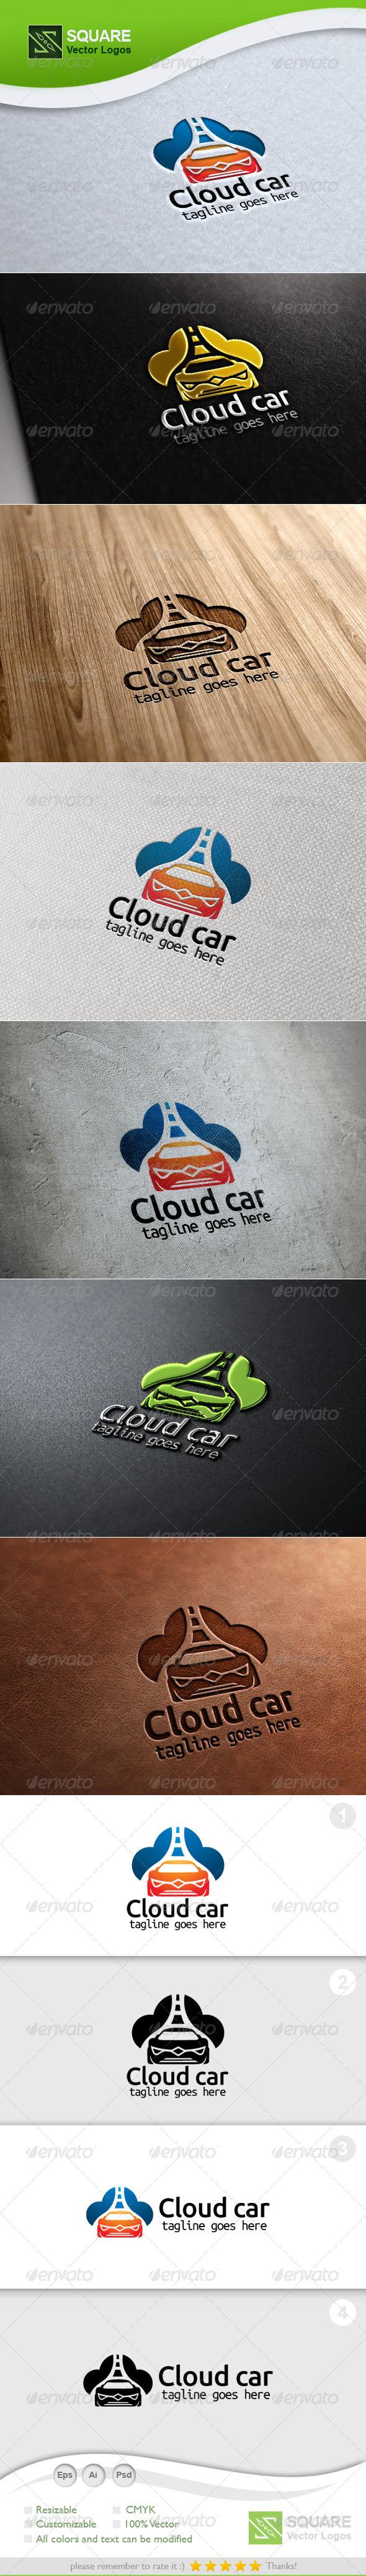 GraphicRiver Cloud Car Vector Logo Template 5883334